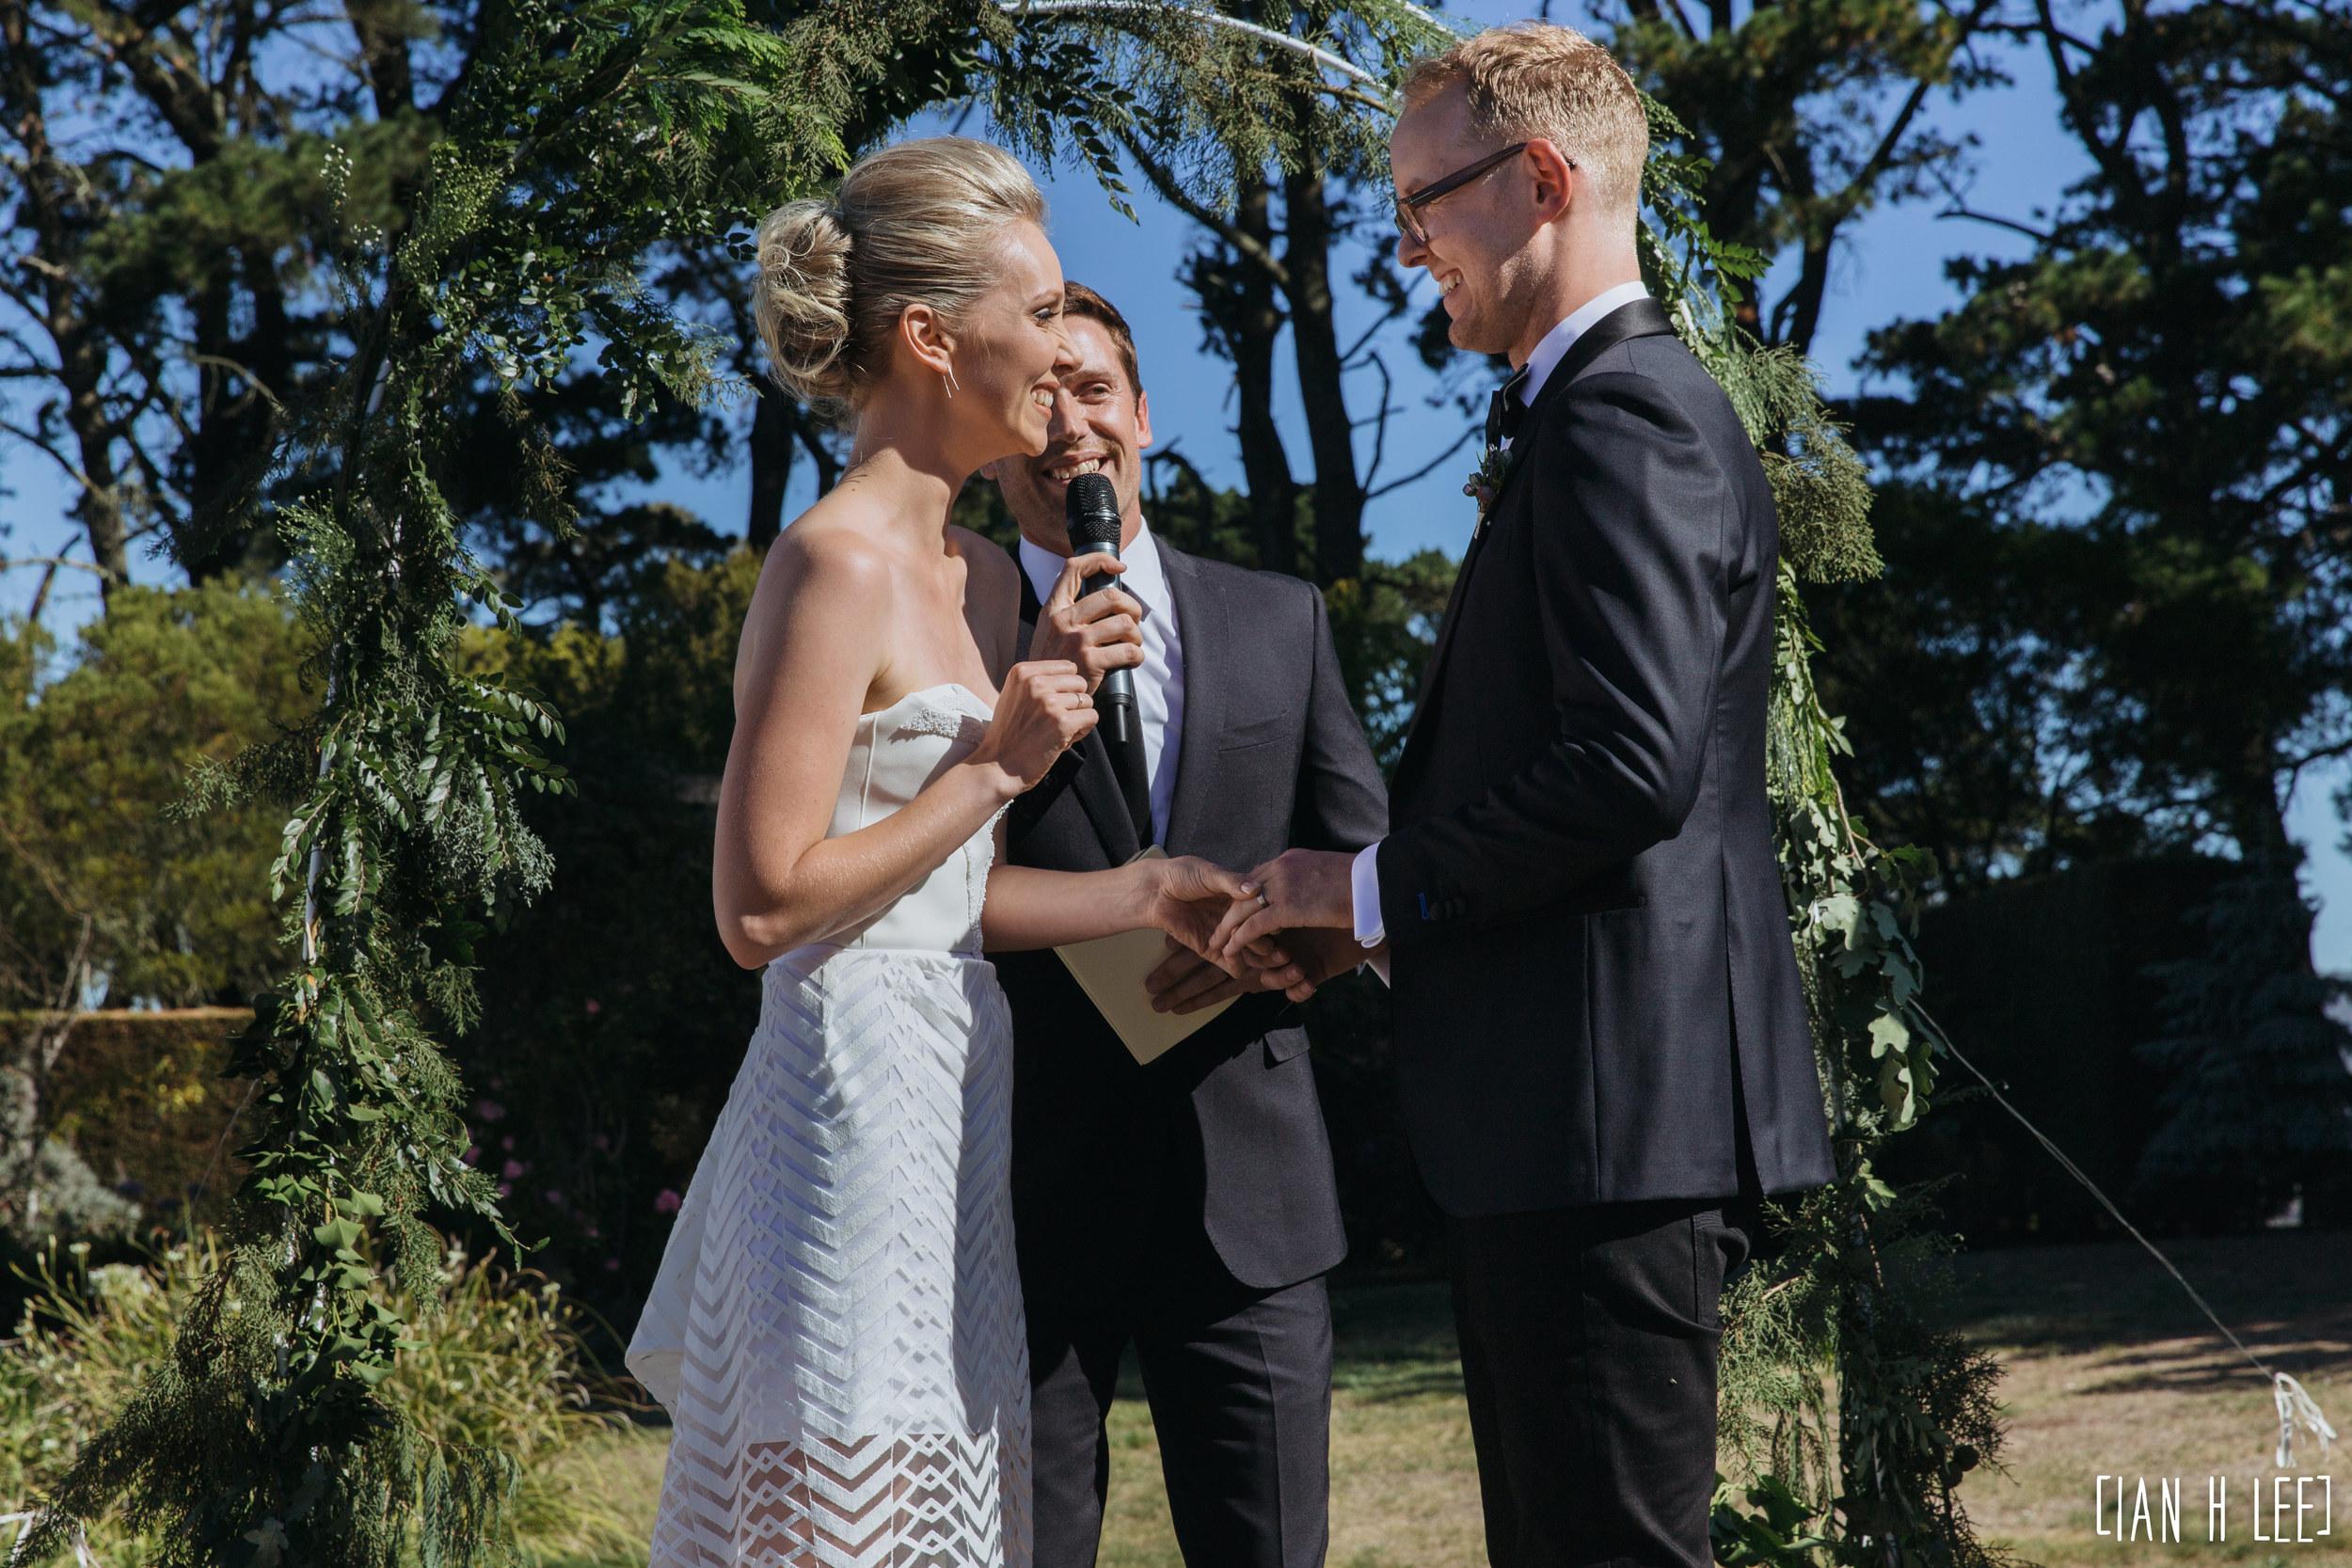 [Ian H Lee] Photography || Weddings - Melbourne || Ewan And Courtney -9723.jpg